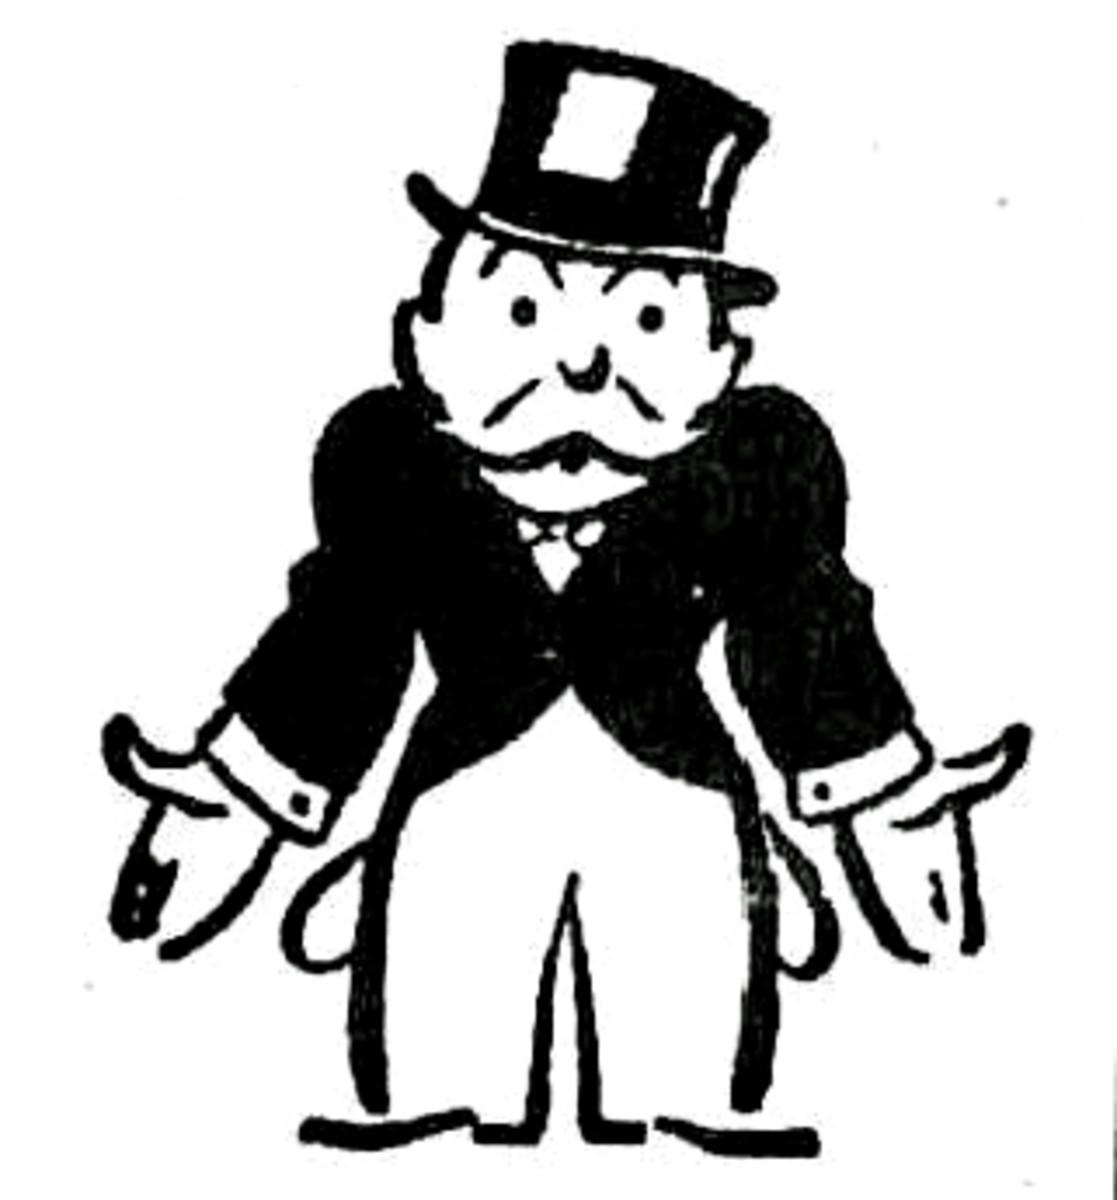 how-budget-surpluses-hurt-the-economy